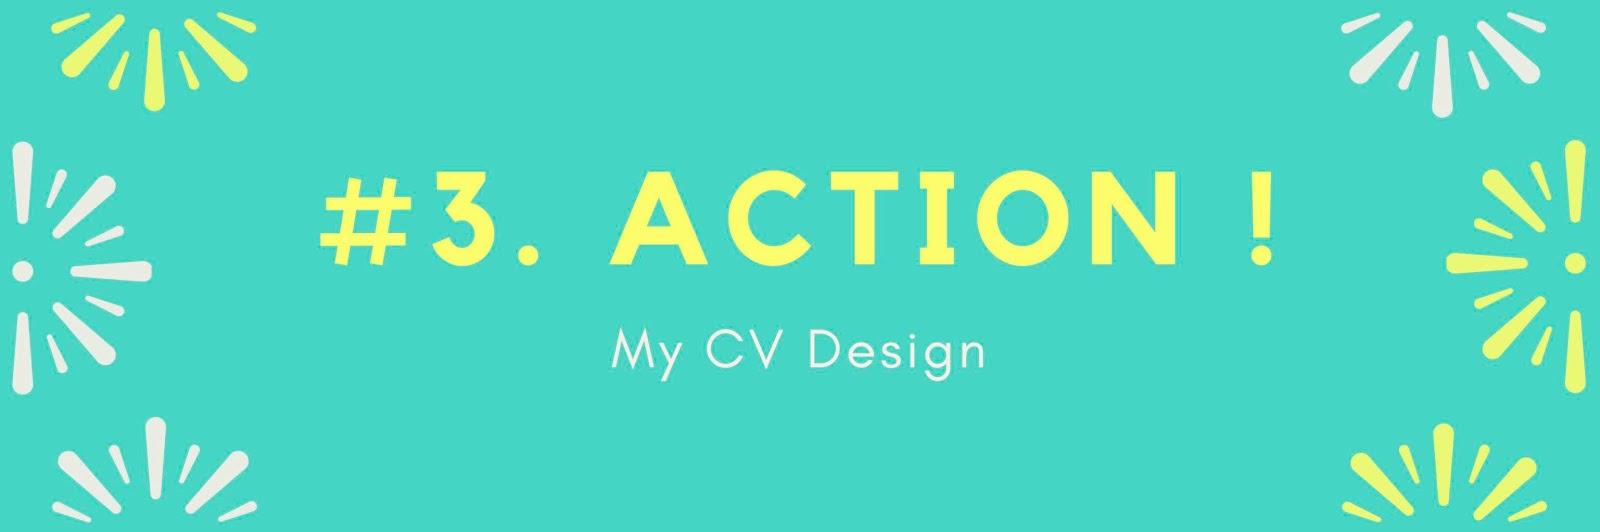 my cv design  3 conseils simples pour un bon cv